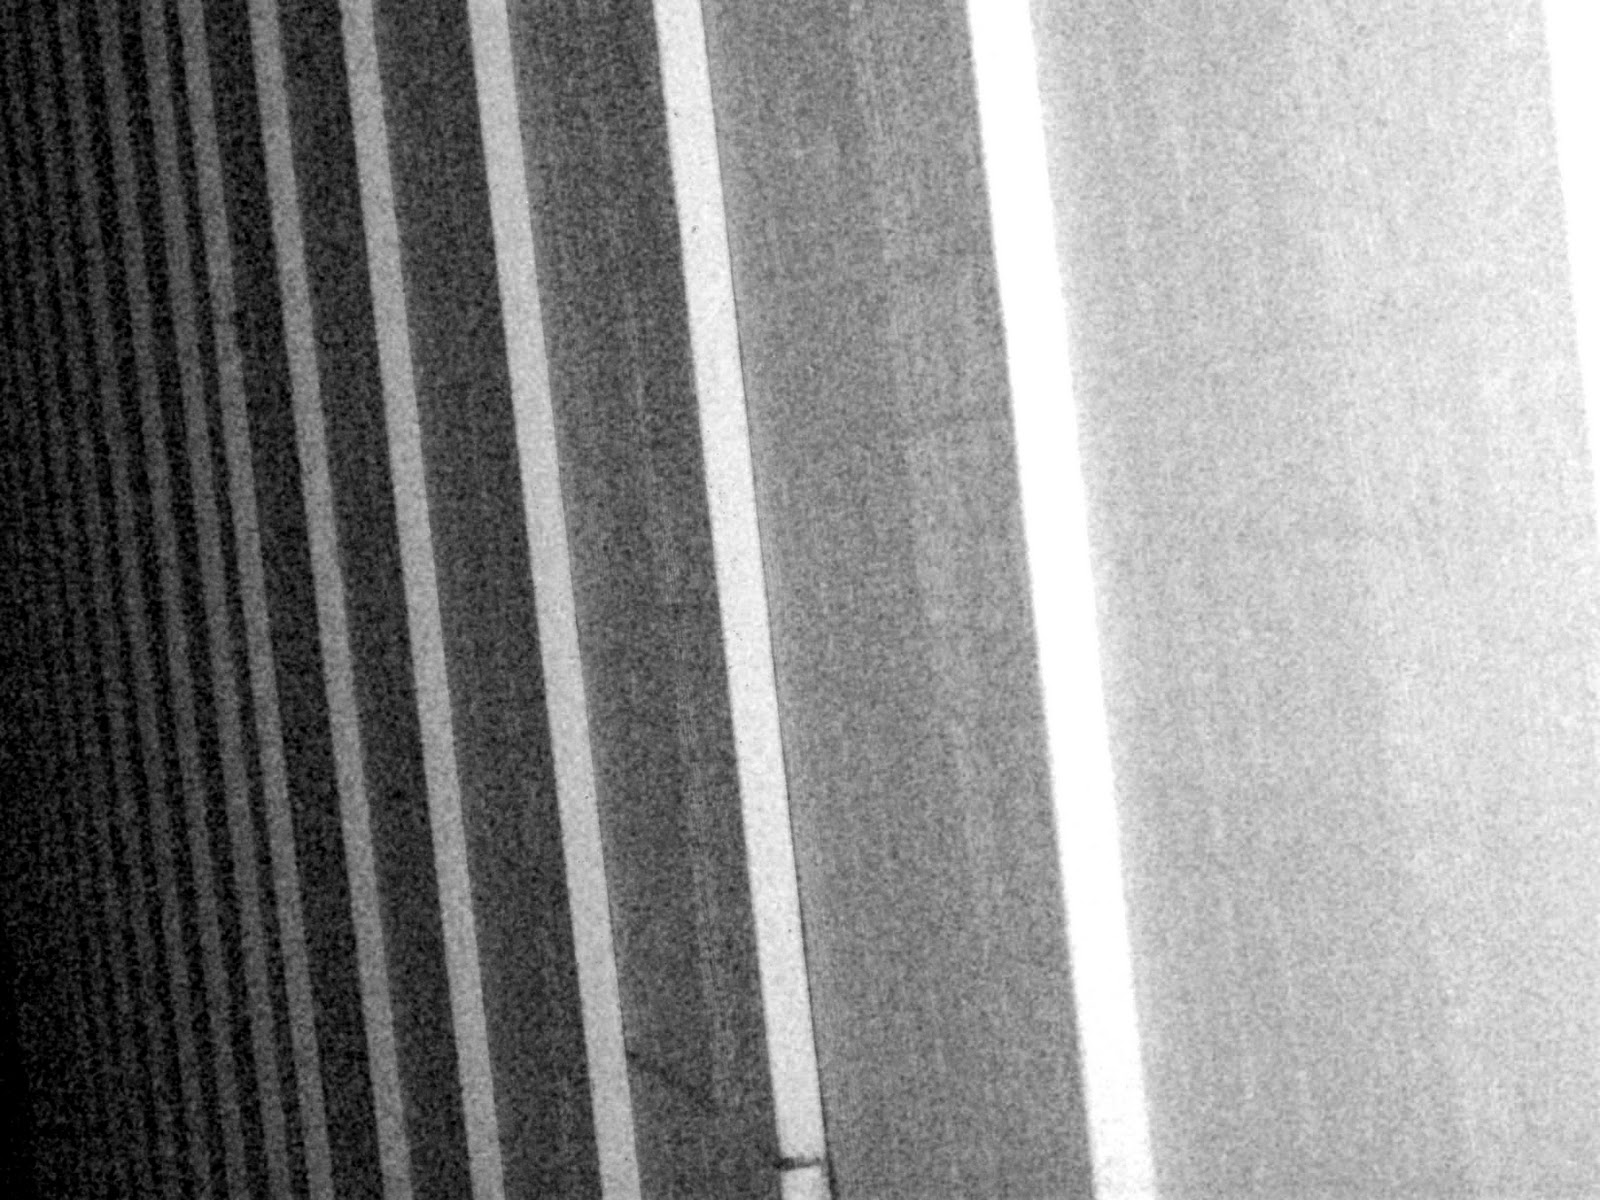 Photography 11 - Jillayna Buller: Movement, Line, Texture